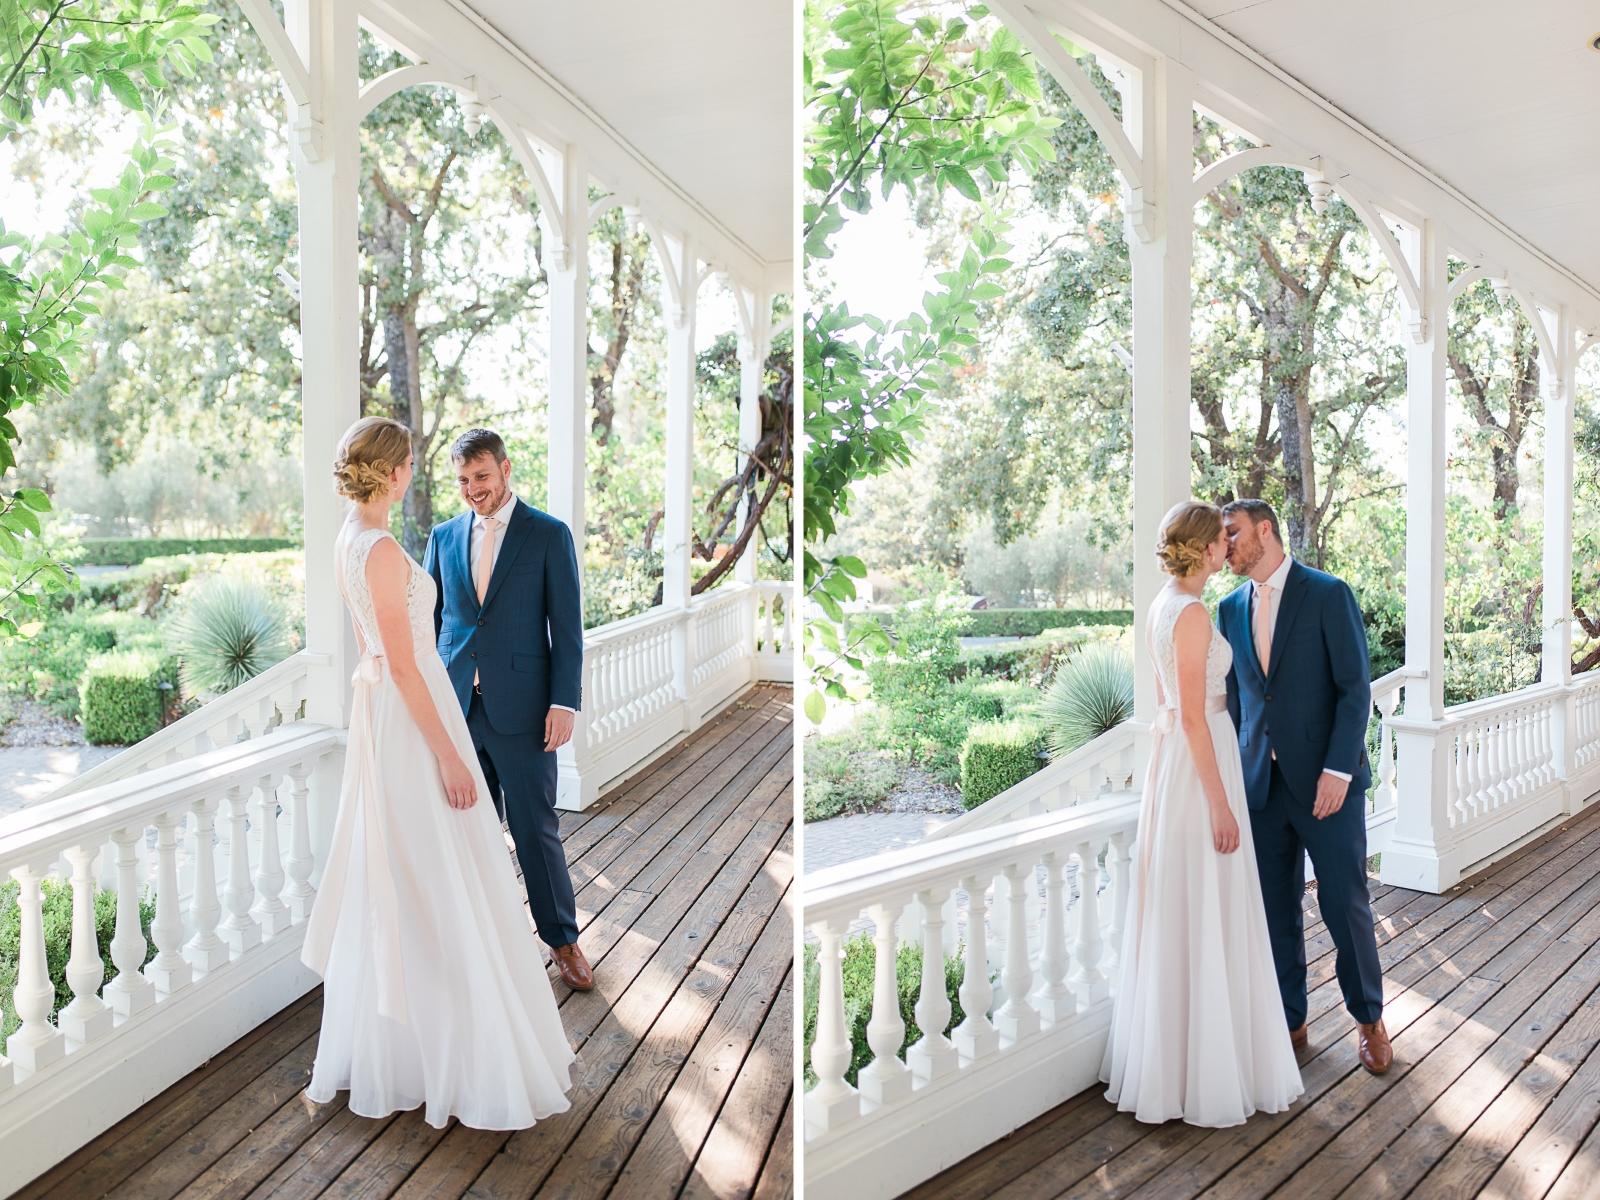 Generals Daughter Wedding Photos by JBJ Pictures - Ramekins Wedding Venue Photographer in Sonoma, Napa (5).jpg